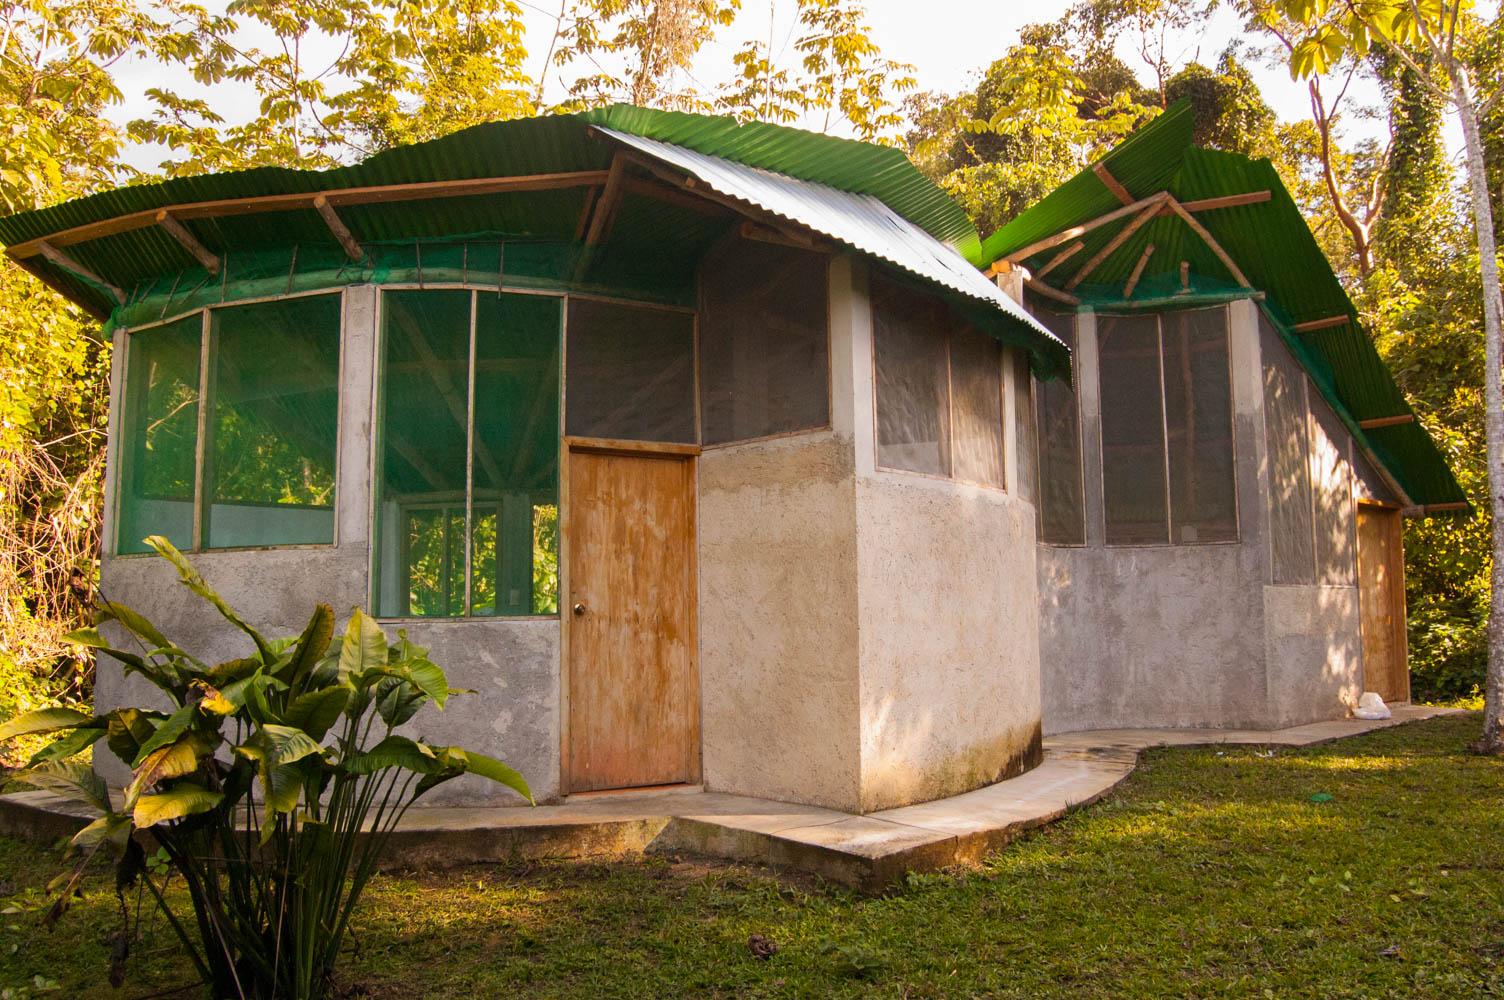 tours_chiapas_bonampak_yaxchilan_palenque_guias_en_chiapas_selva_lacandona_mayas_lacandones_restaurante_campamento_lacandon